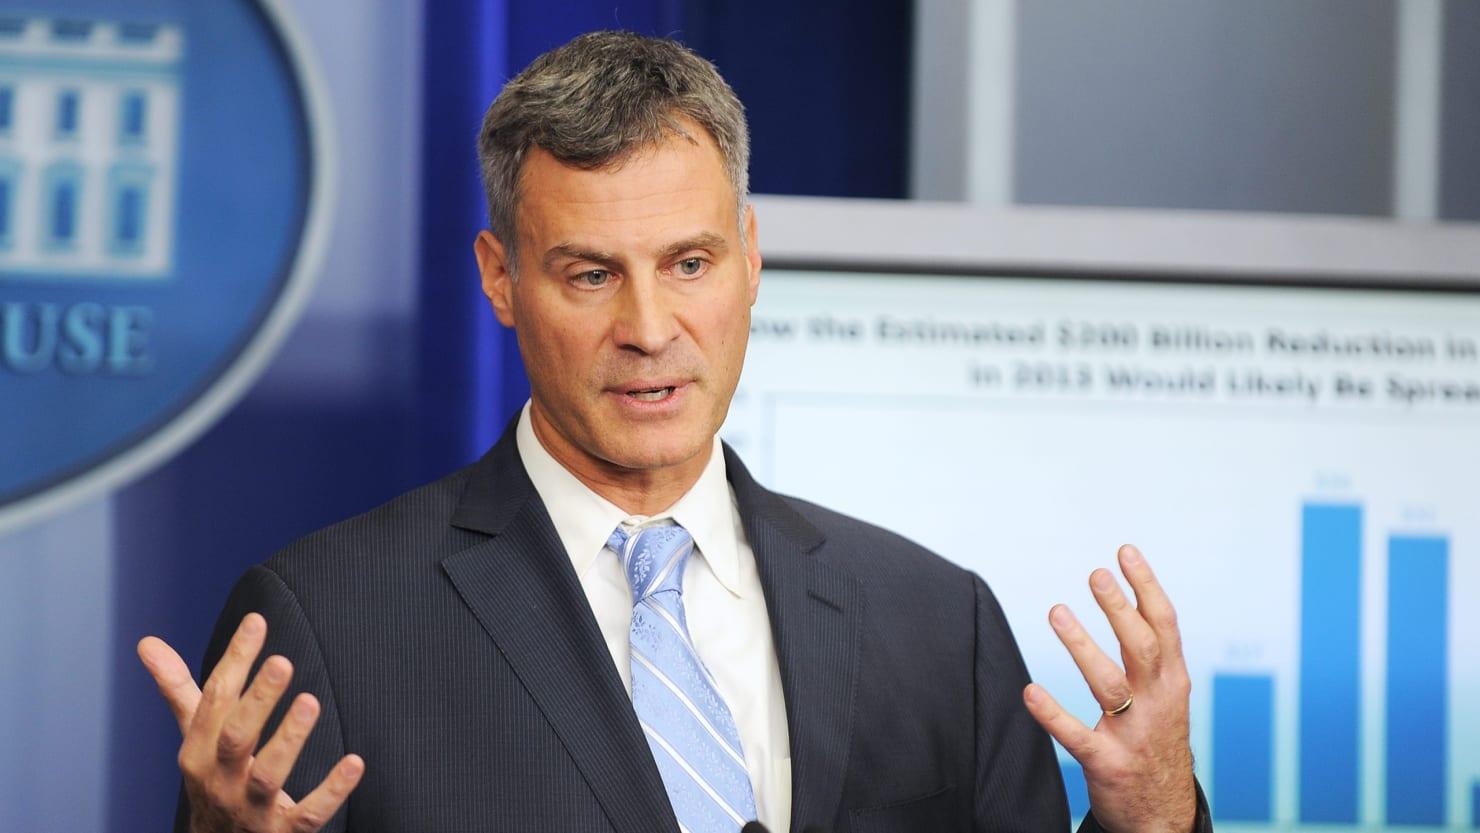 Alan Krueger, Noted Economic Adviser to Obama, Dies at 58